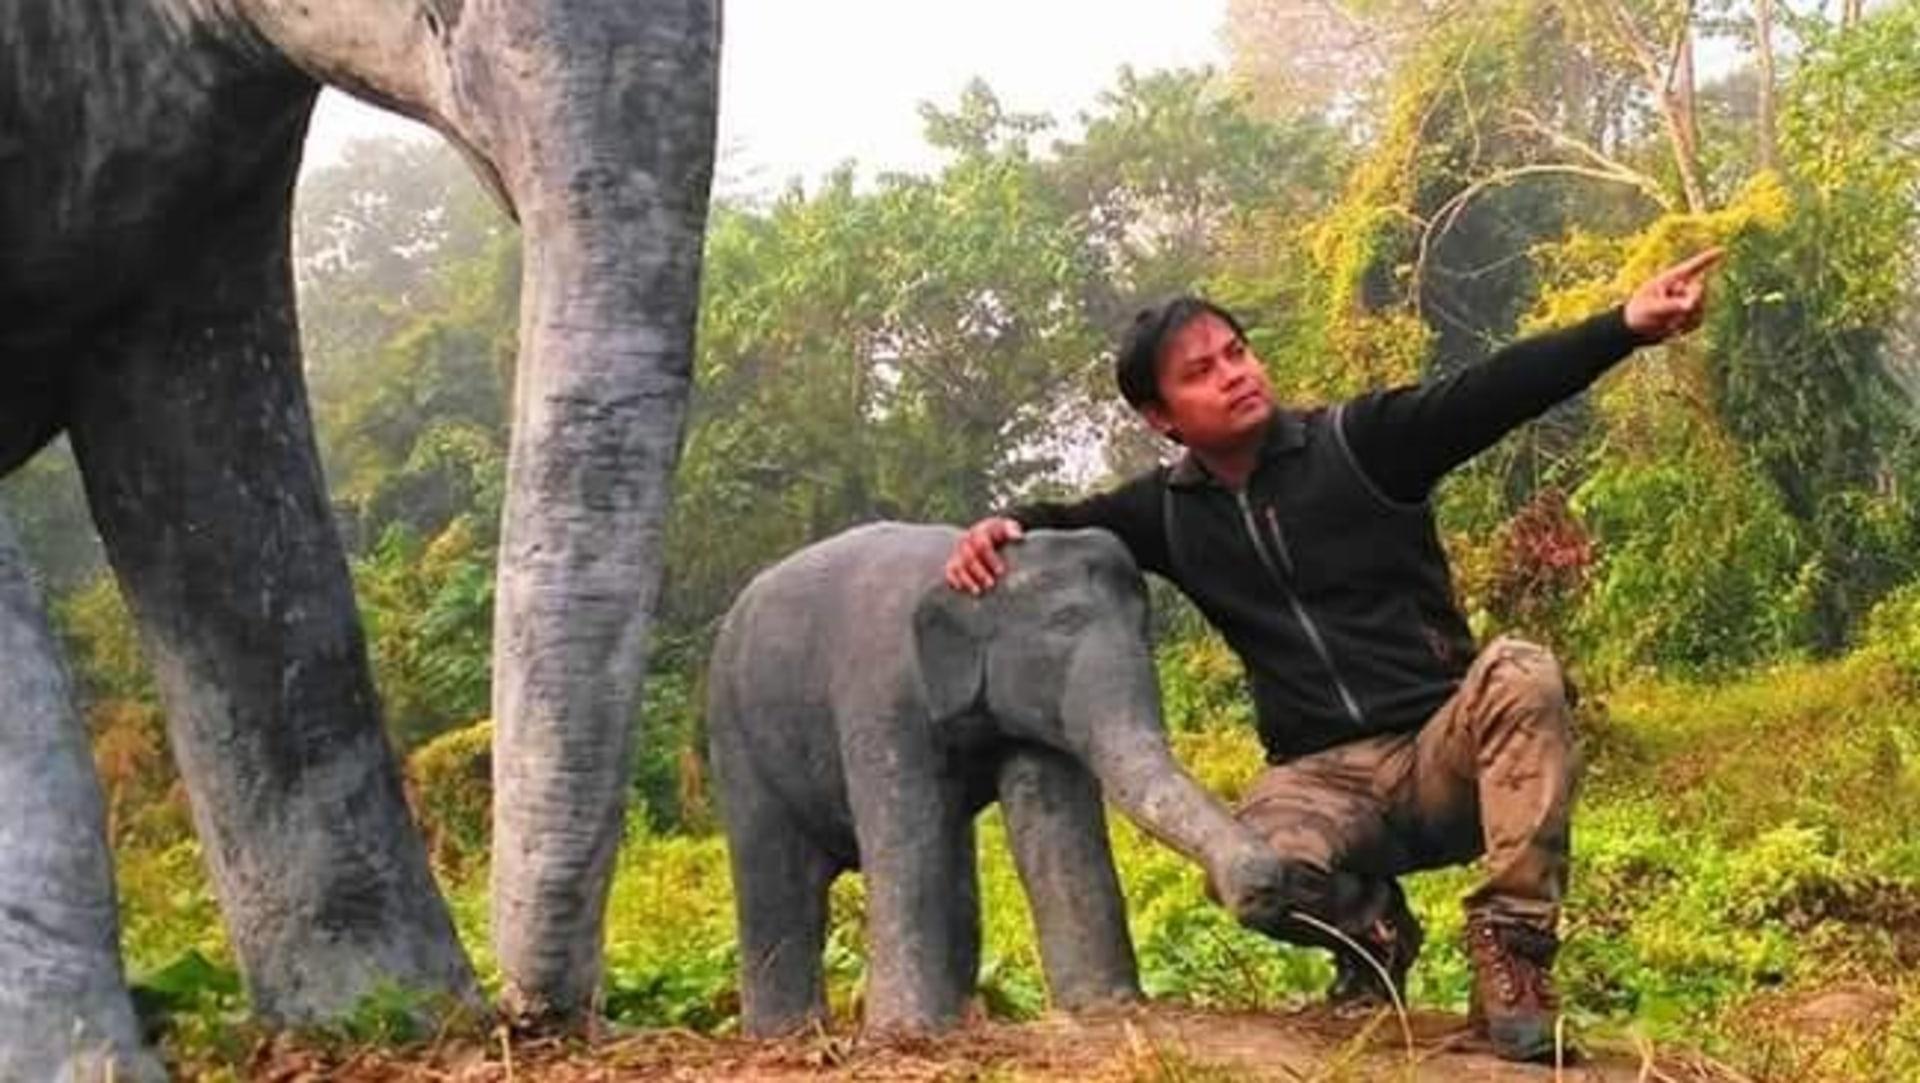 Binod 'Dulu' Bora: Assam's Elephant Man